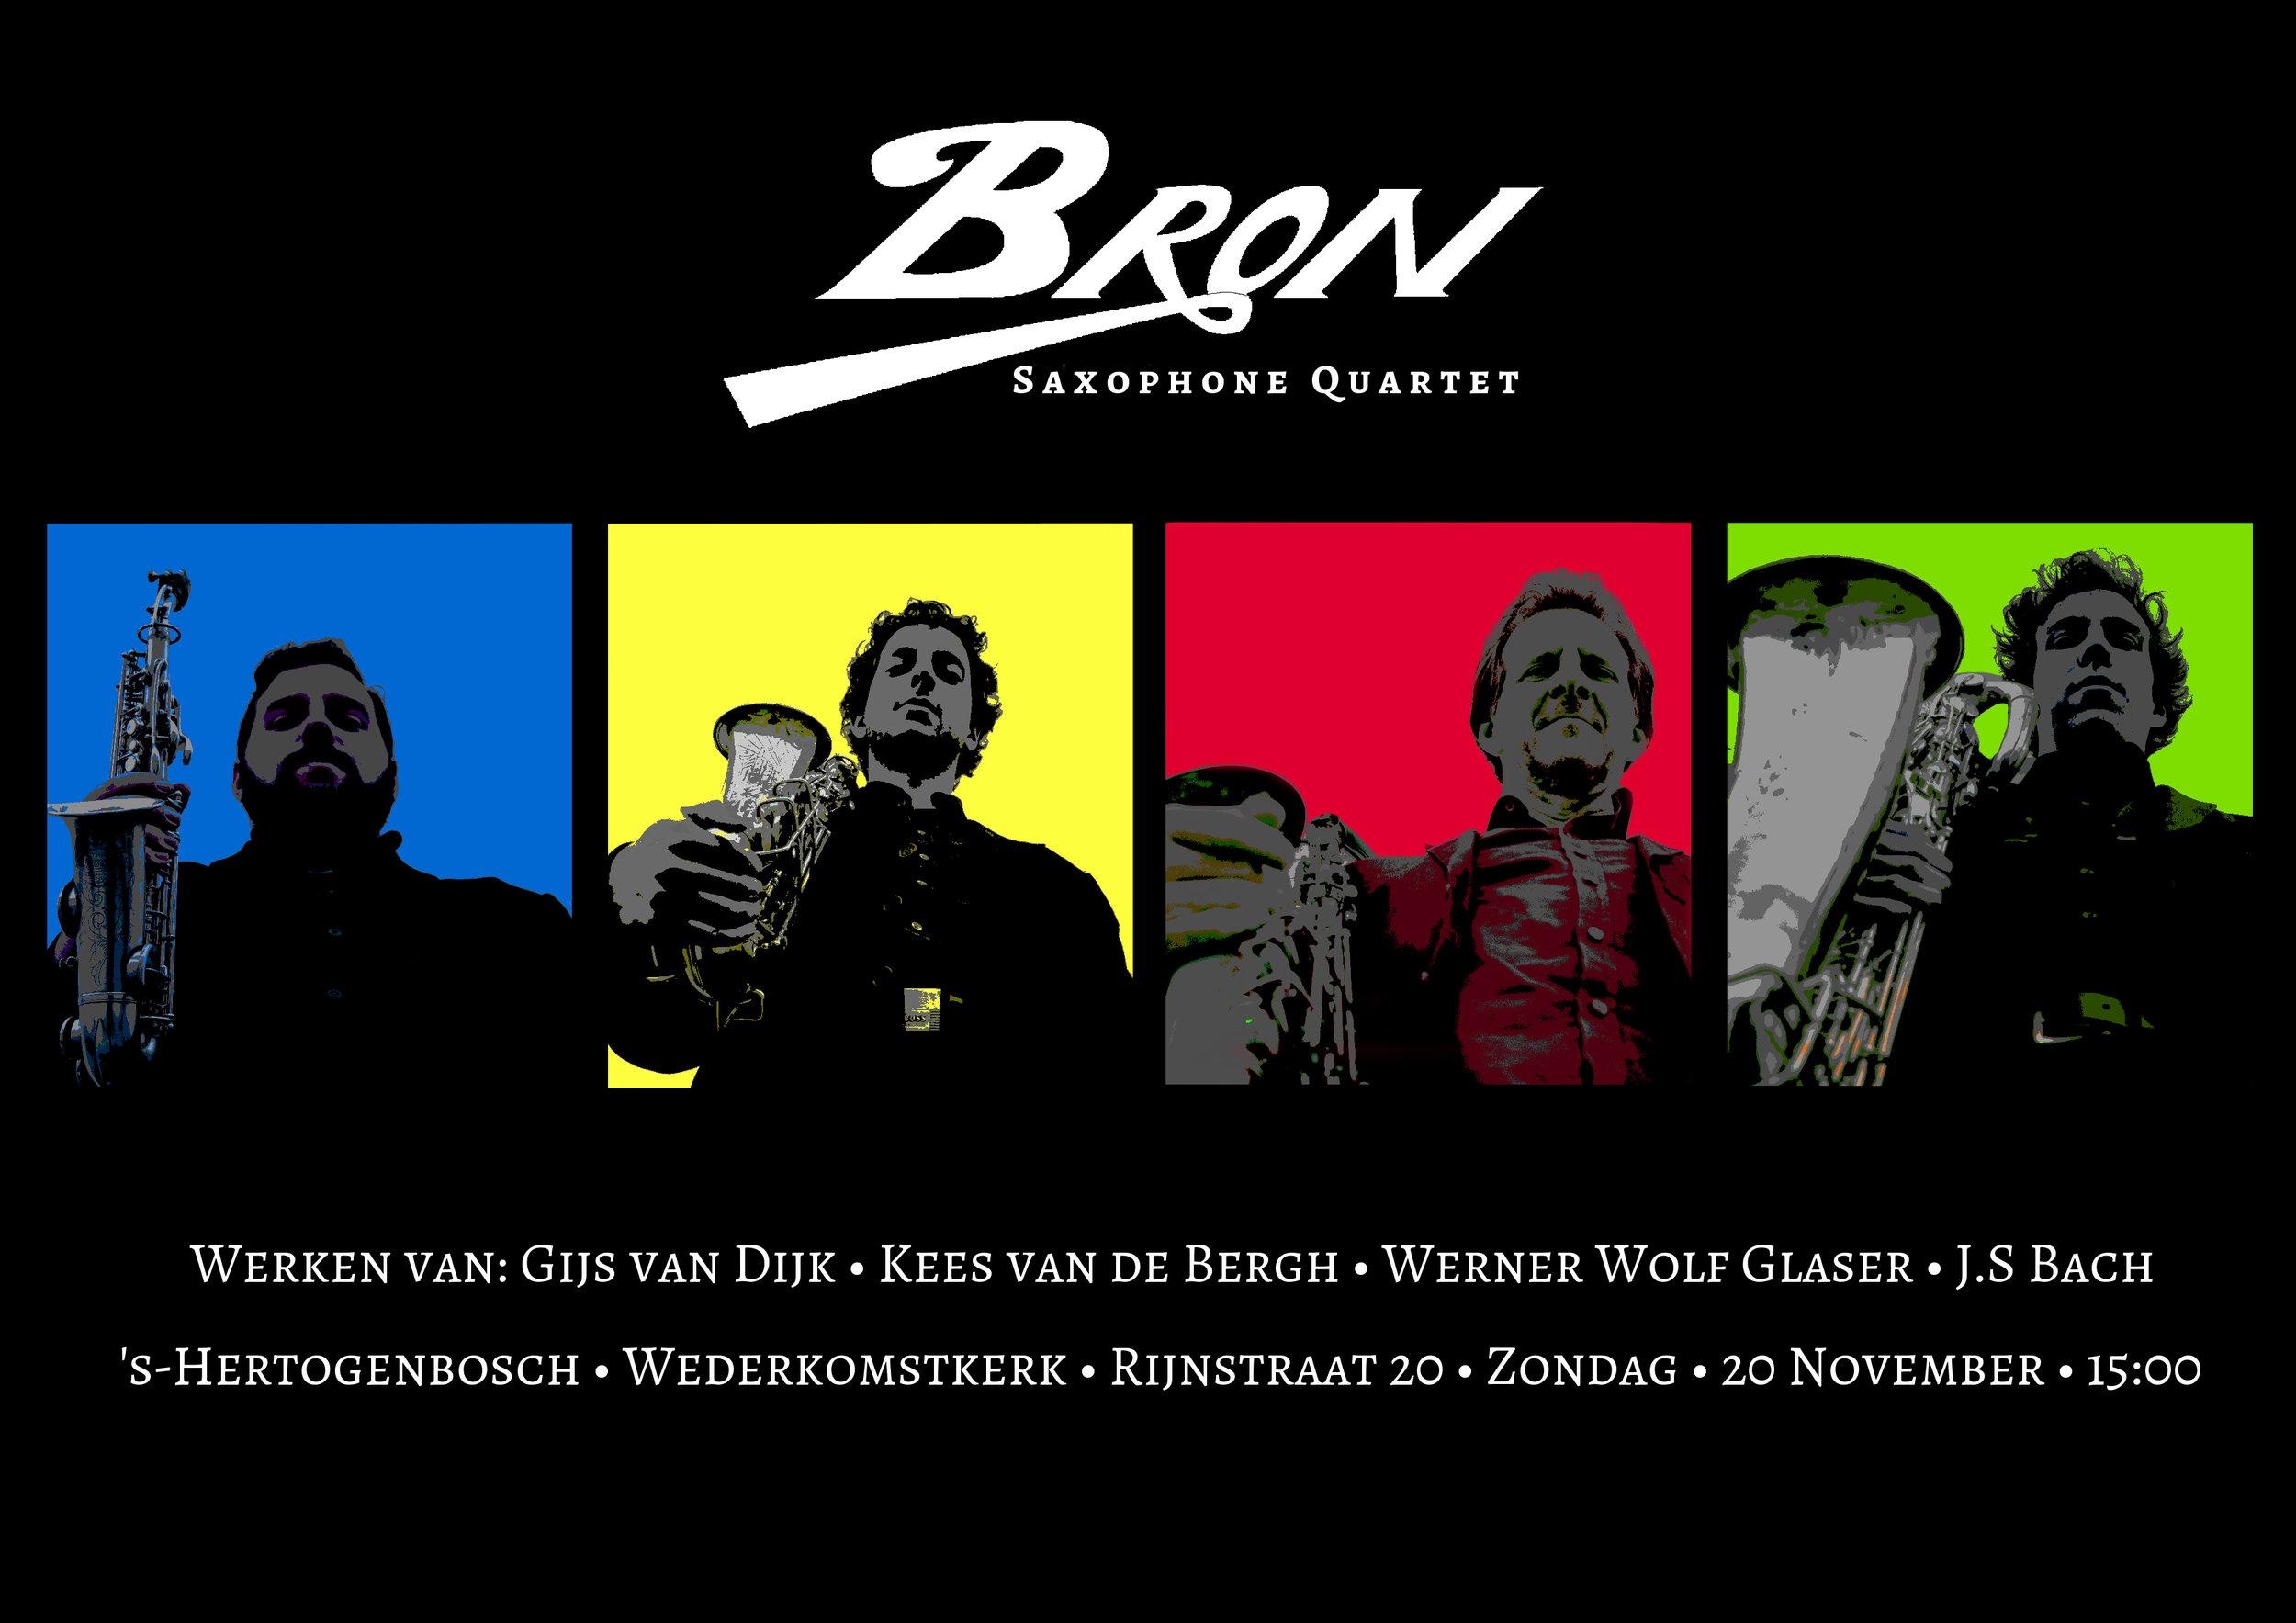 Wederkomstkerk - Bron Saxophone Quartet - November 20 - Version 14.jpg